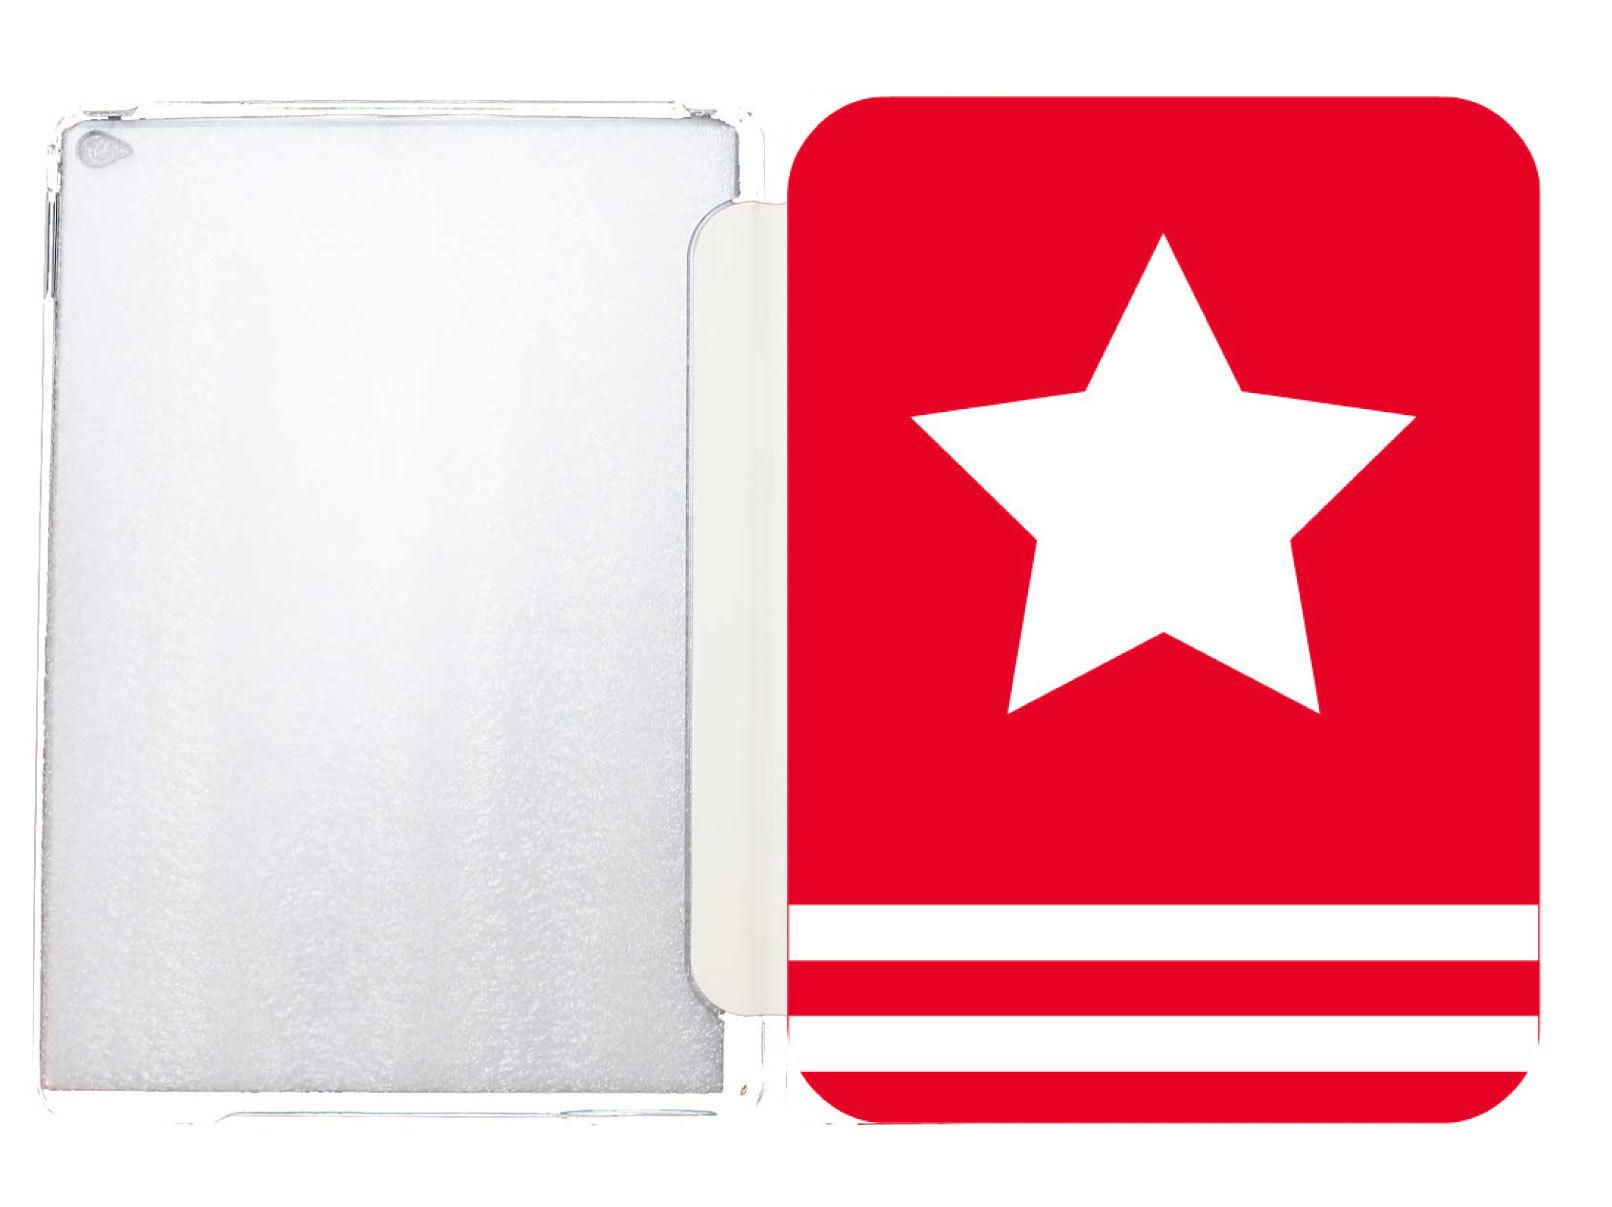 【iPadカバー】全8カラー☆プリント iPad 2017(9.5インチ)/ iPad Air 2 / iPad miniに対応